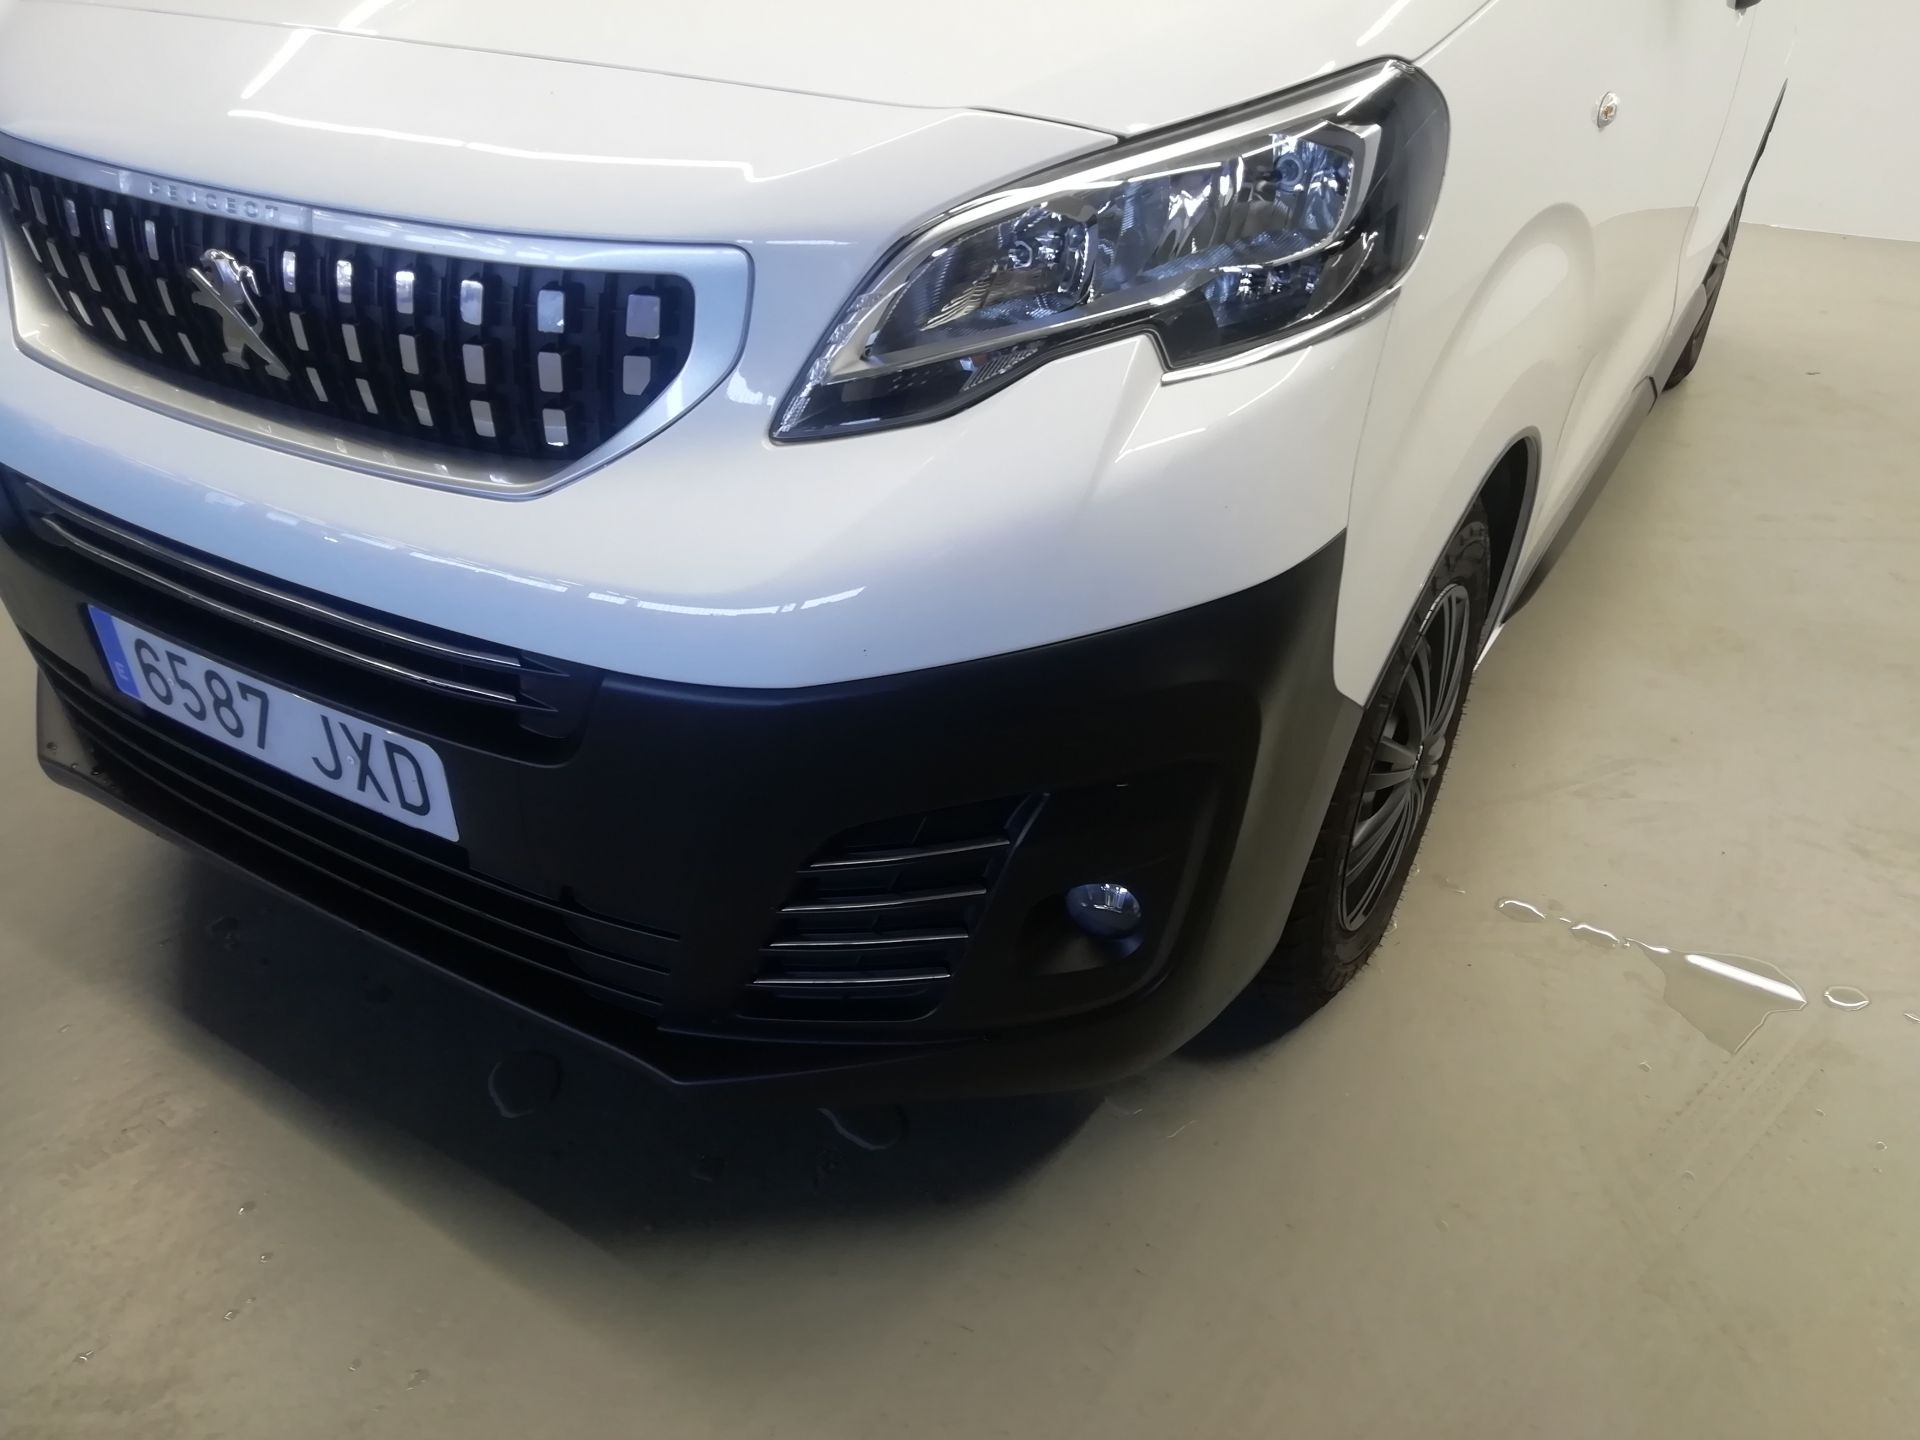 Peugeot Expert Furg. Premium BlueHDi 85KW (115) Compact